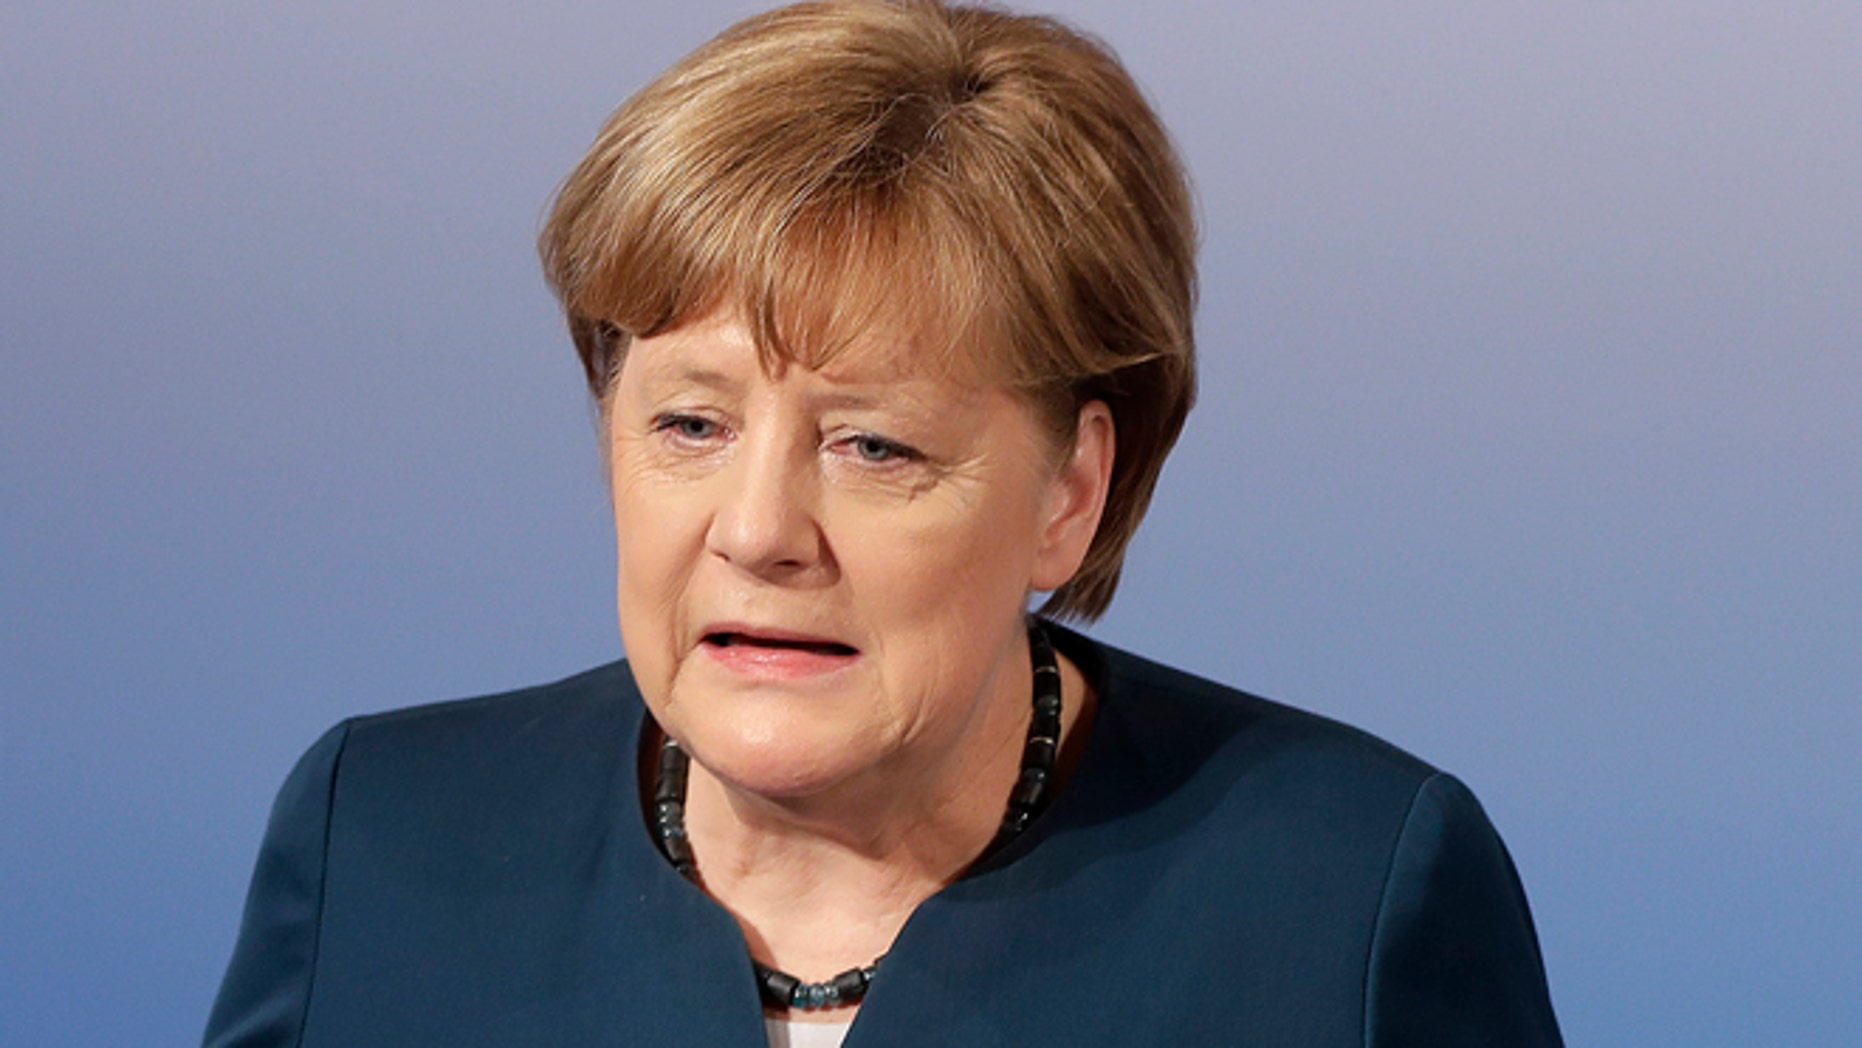 Feb. 18, 2017: German Chancellor Angela Merkel speaks in Munich, Germany.